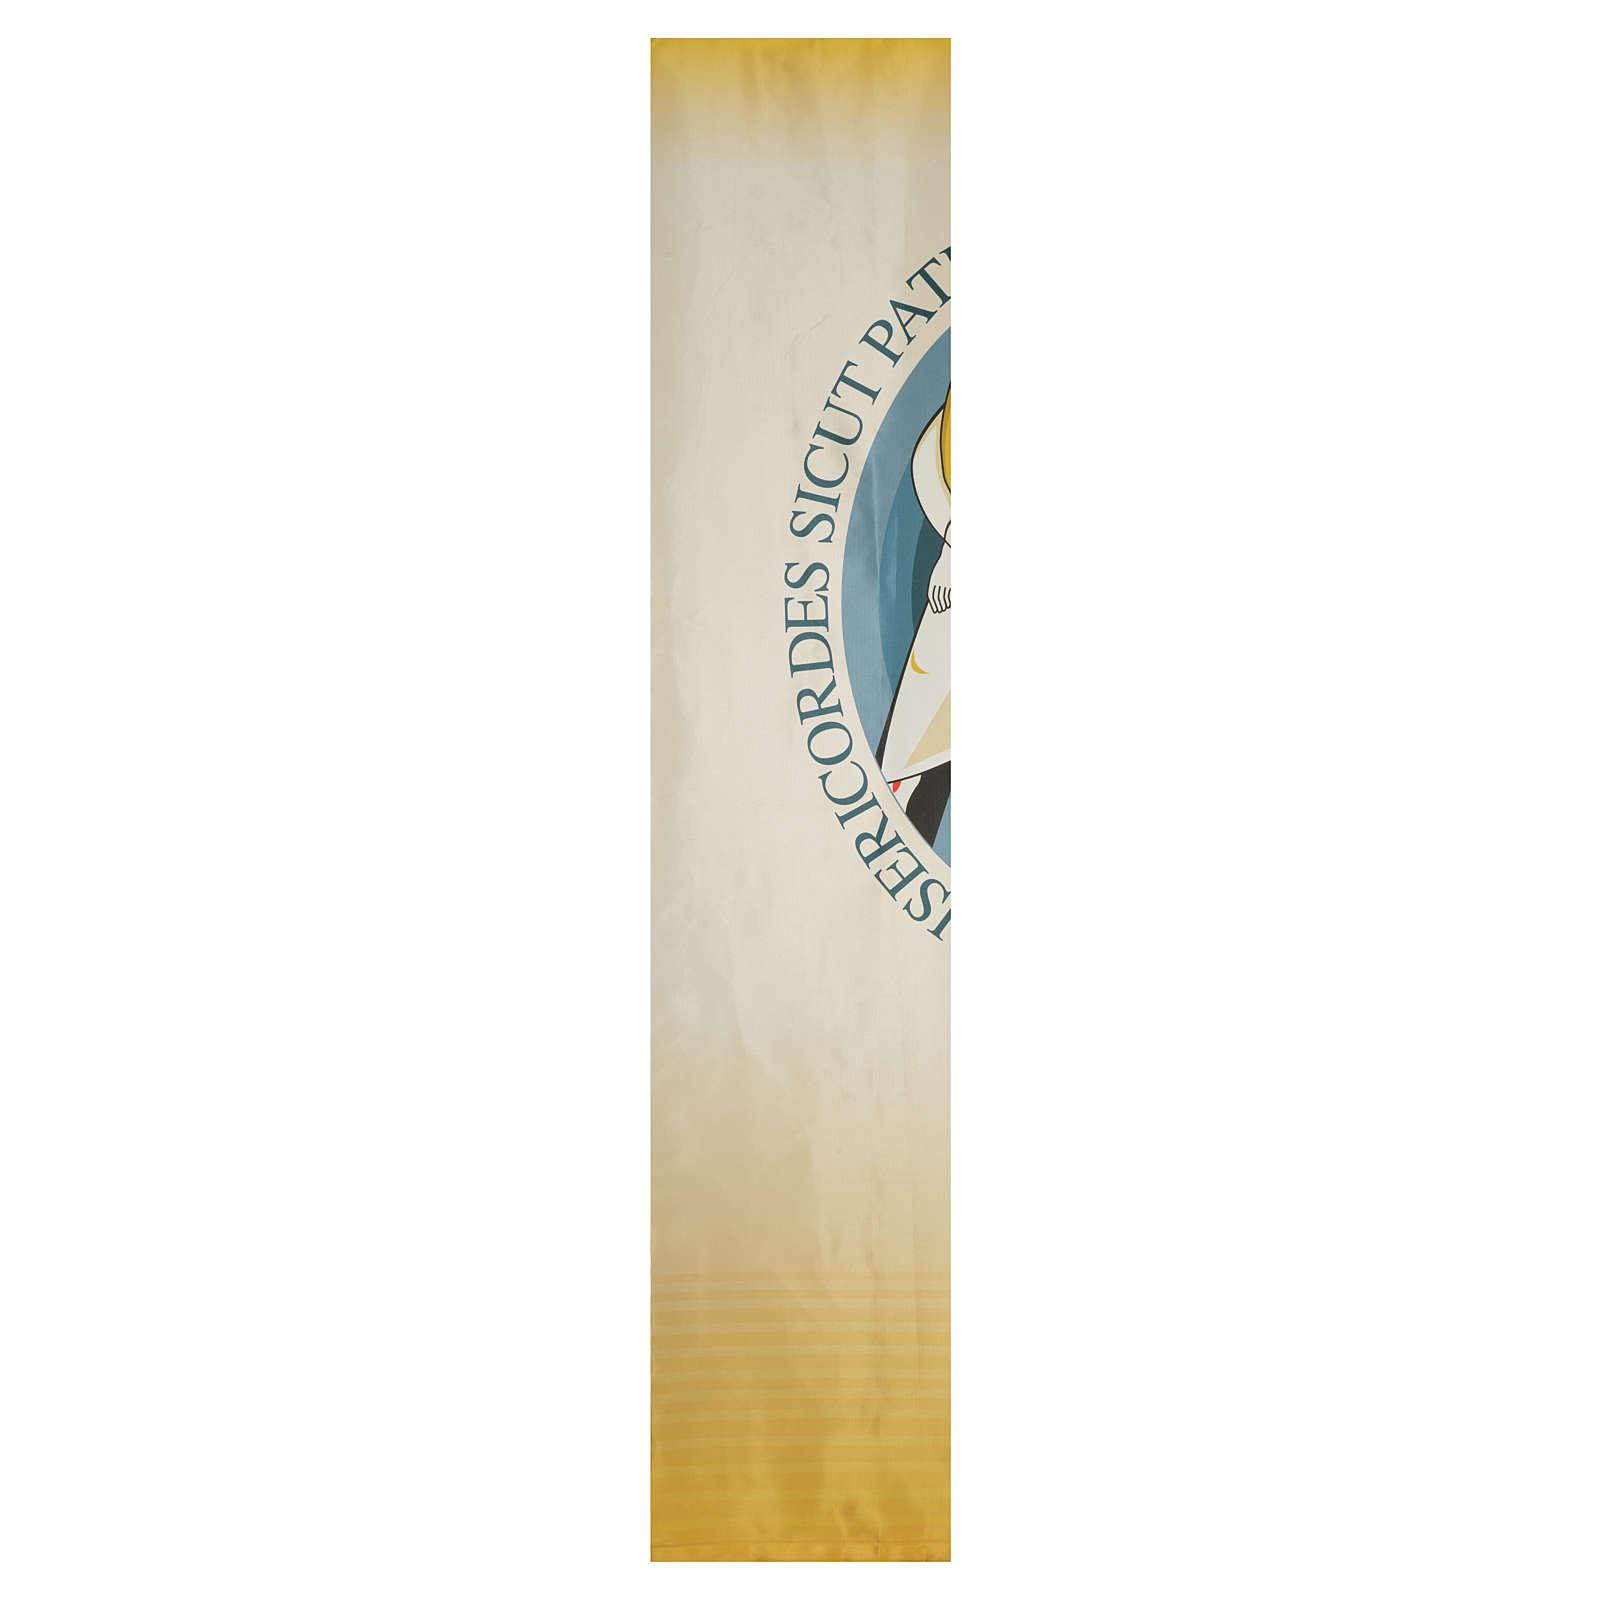 STOCK Logo Giubileo Misericordia LATINO su tessuto 110x250 cm stampa 3